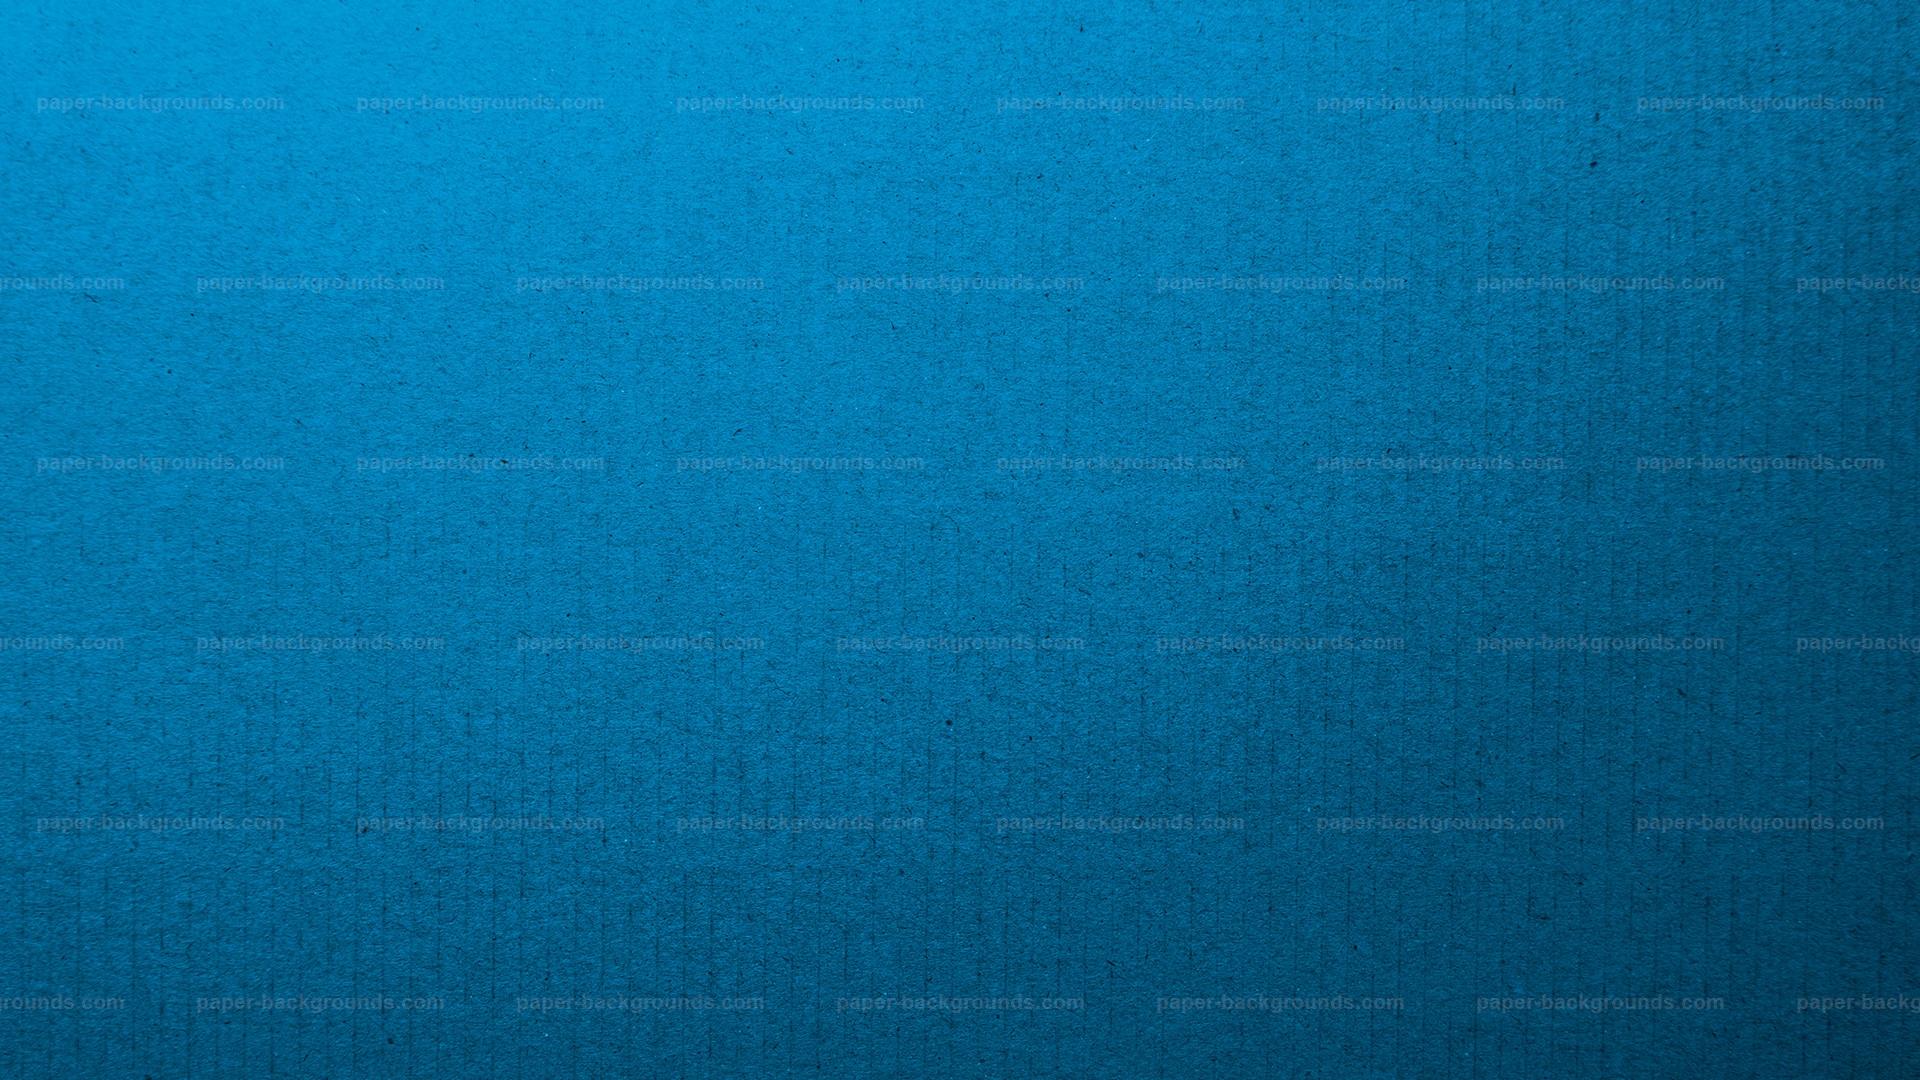 wallpaper hd wallpapers source 1080p hd wallpaper hd wallpapers plus 1920x1080